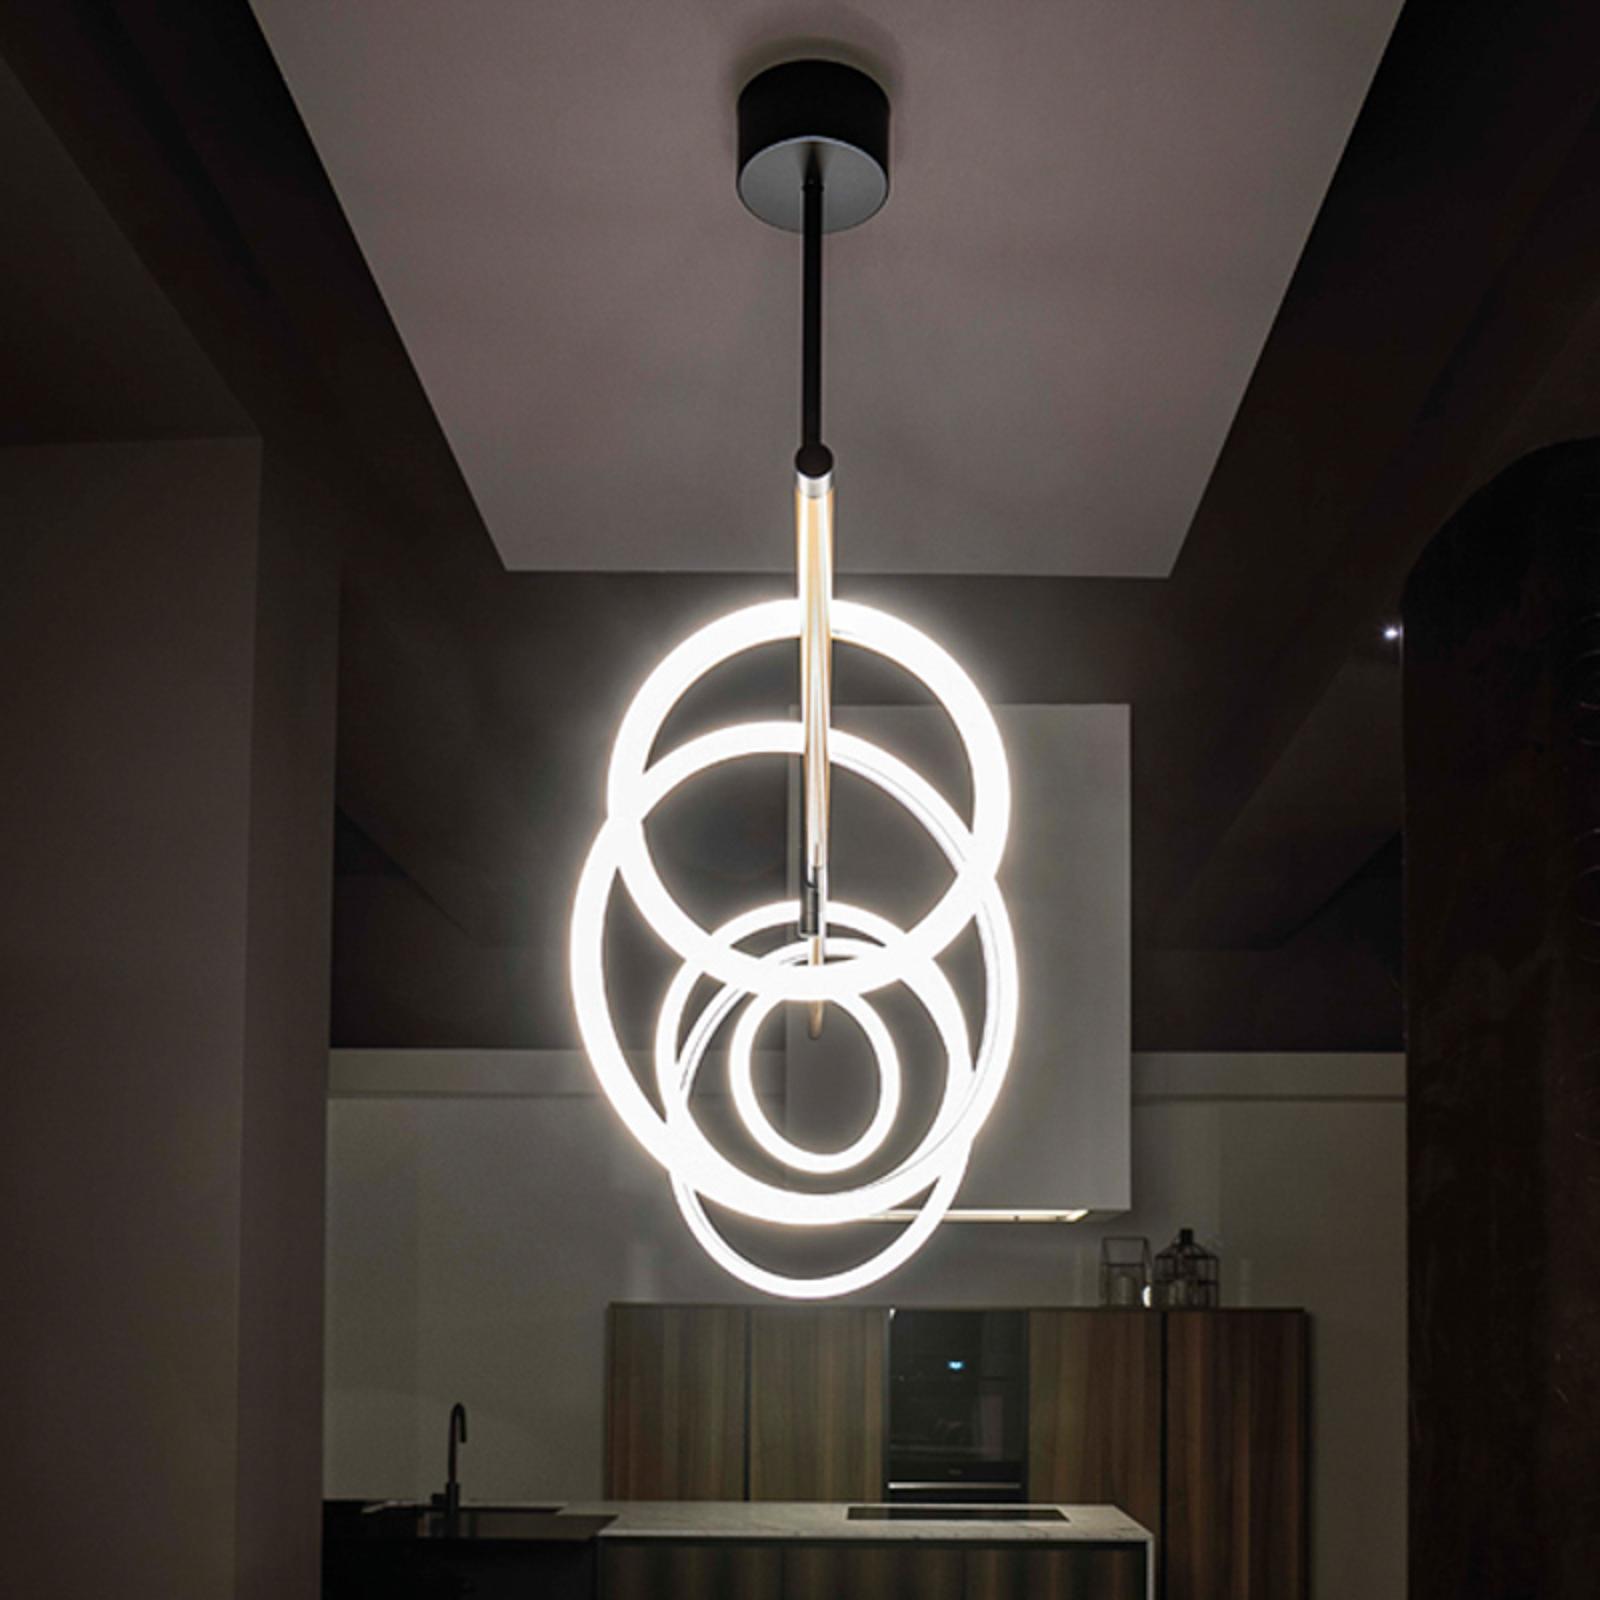 LED-Hängeleuchte Ulaop, fünf Ringe